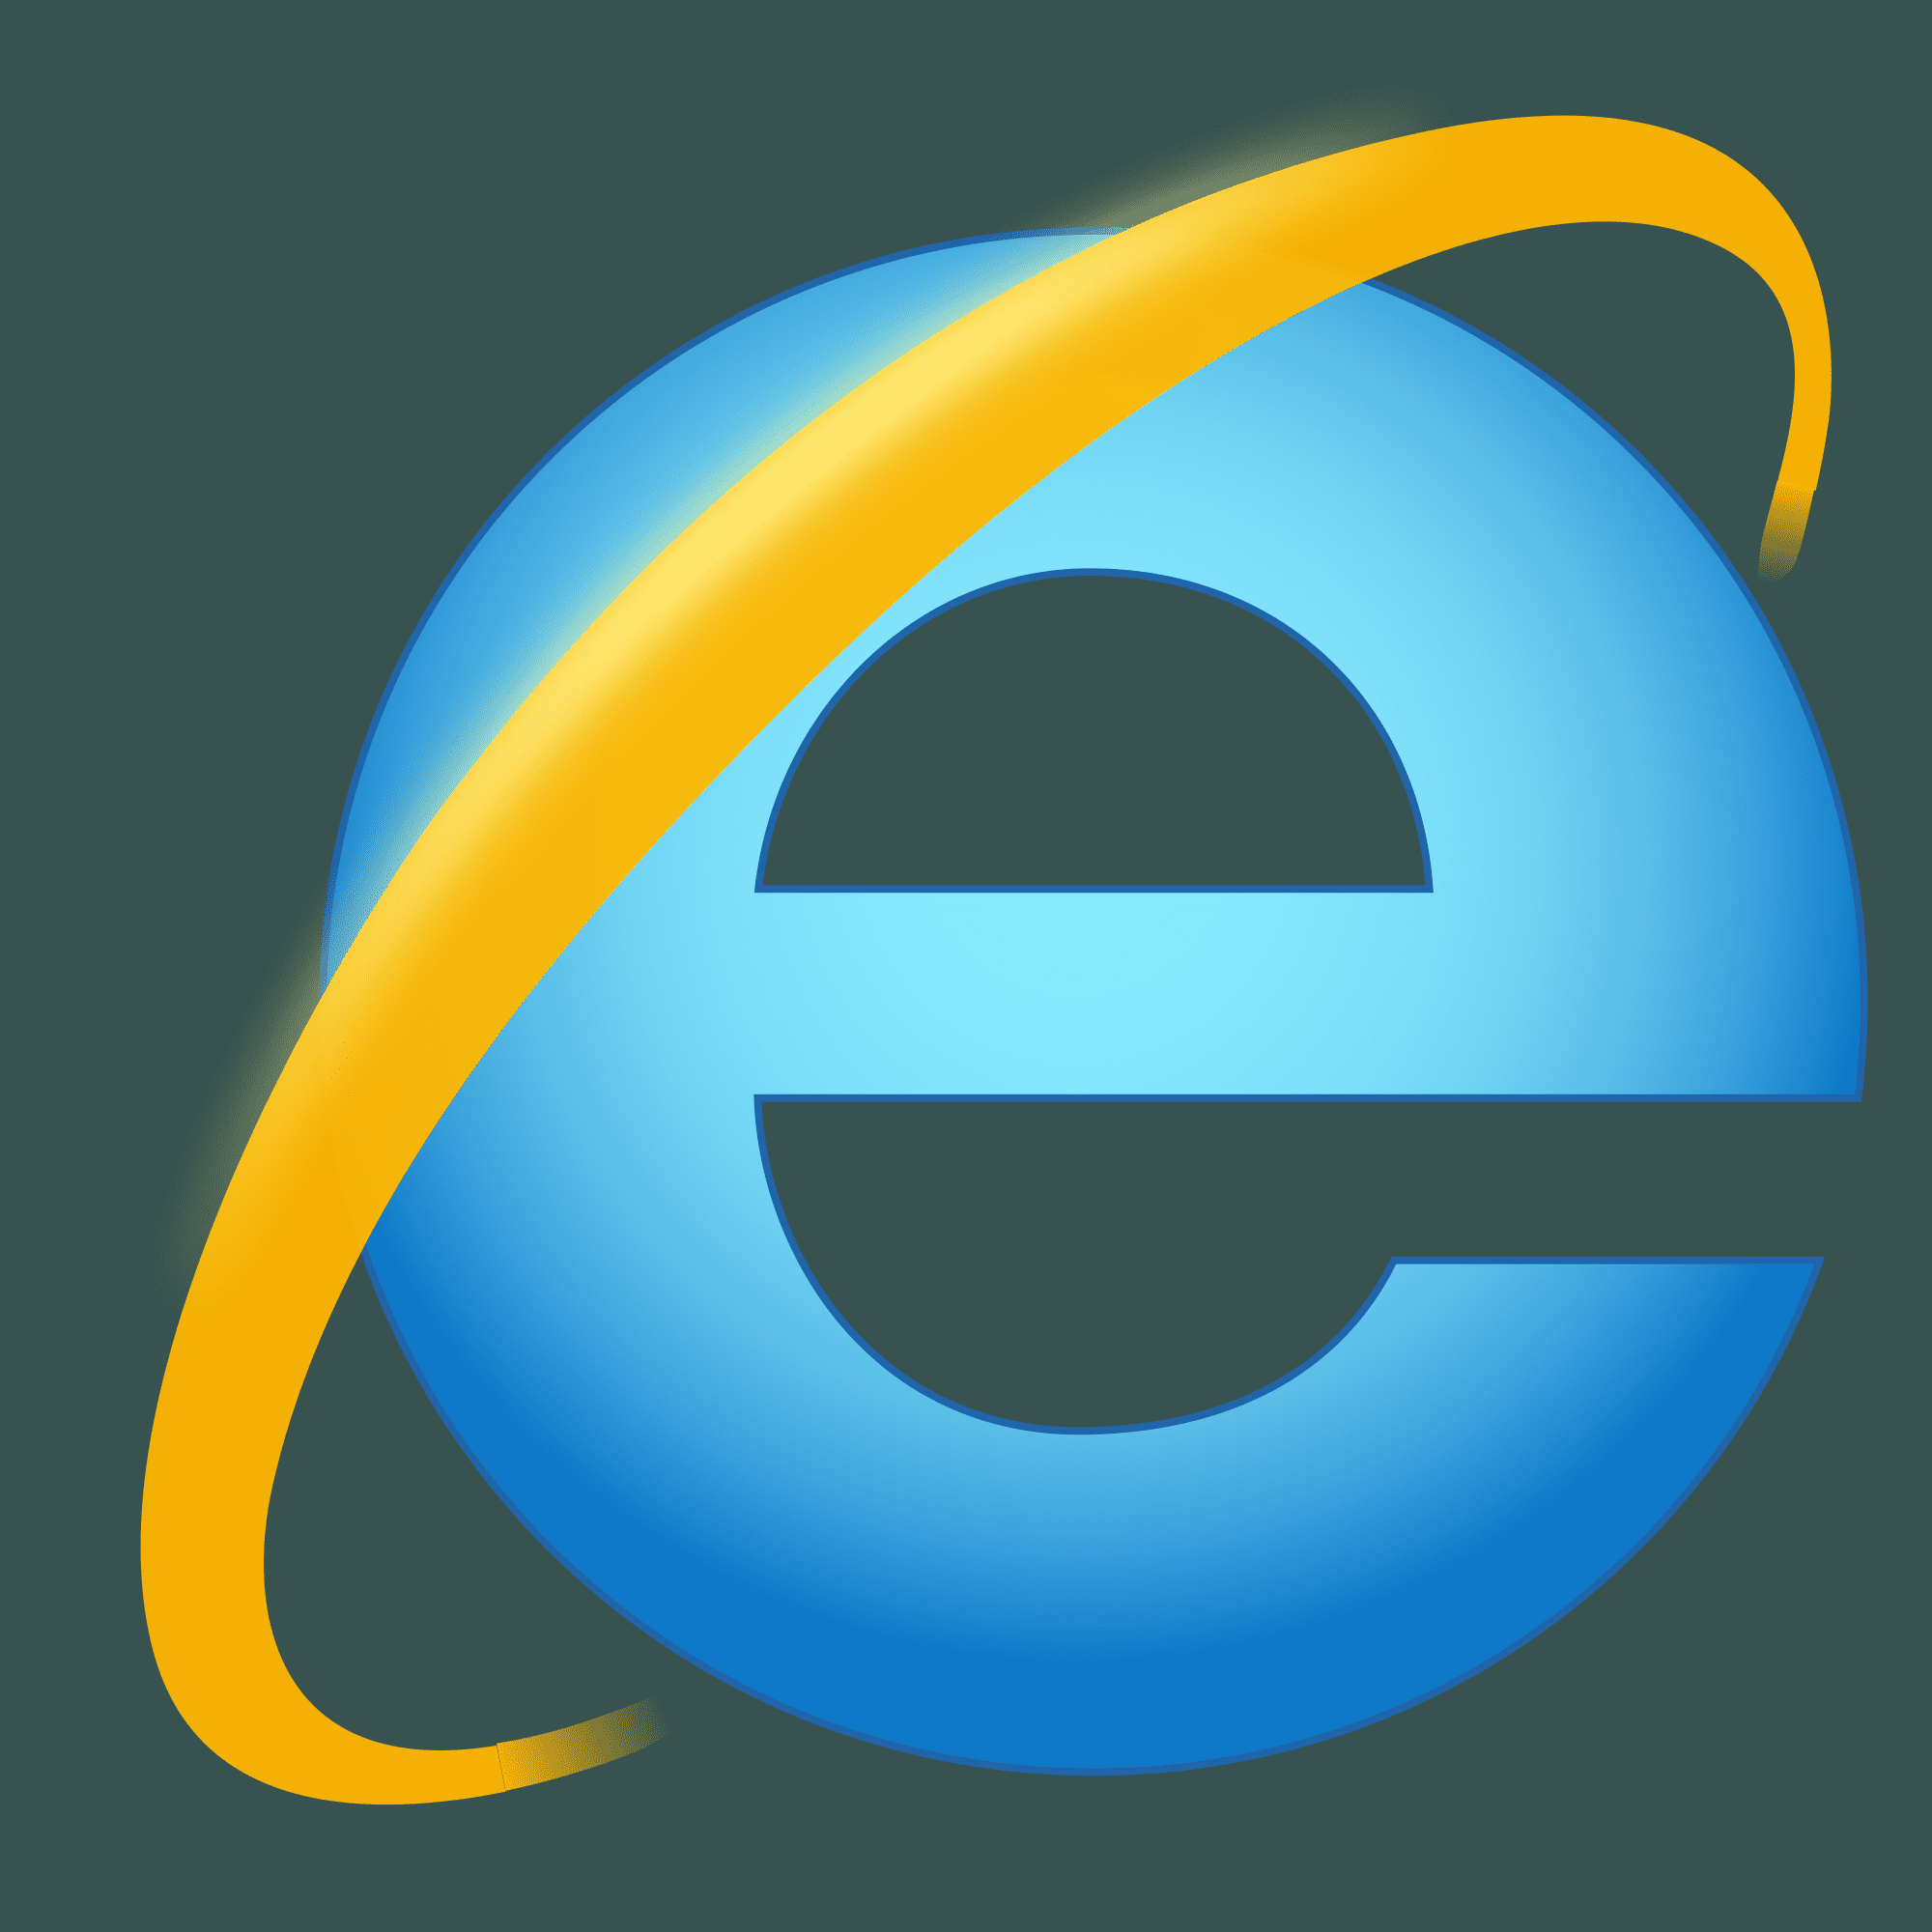 Download Internet Explorer 11 (Offline installer)